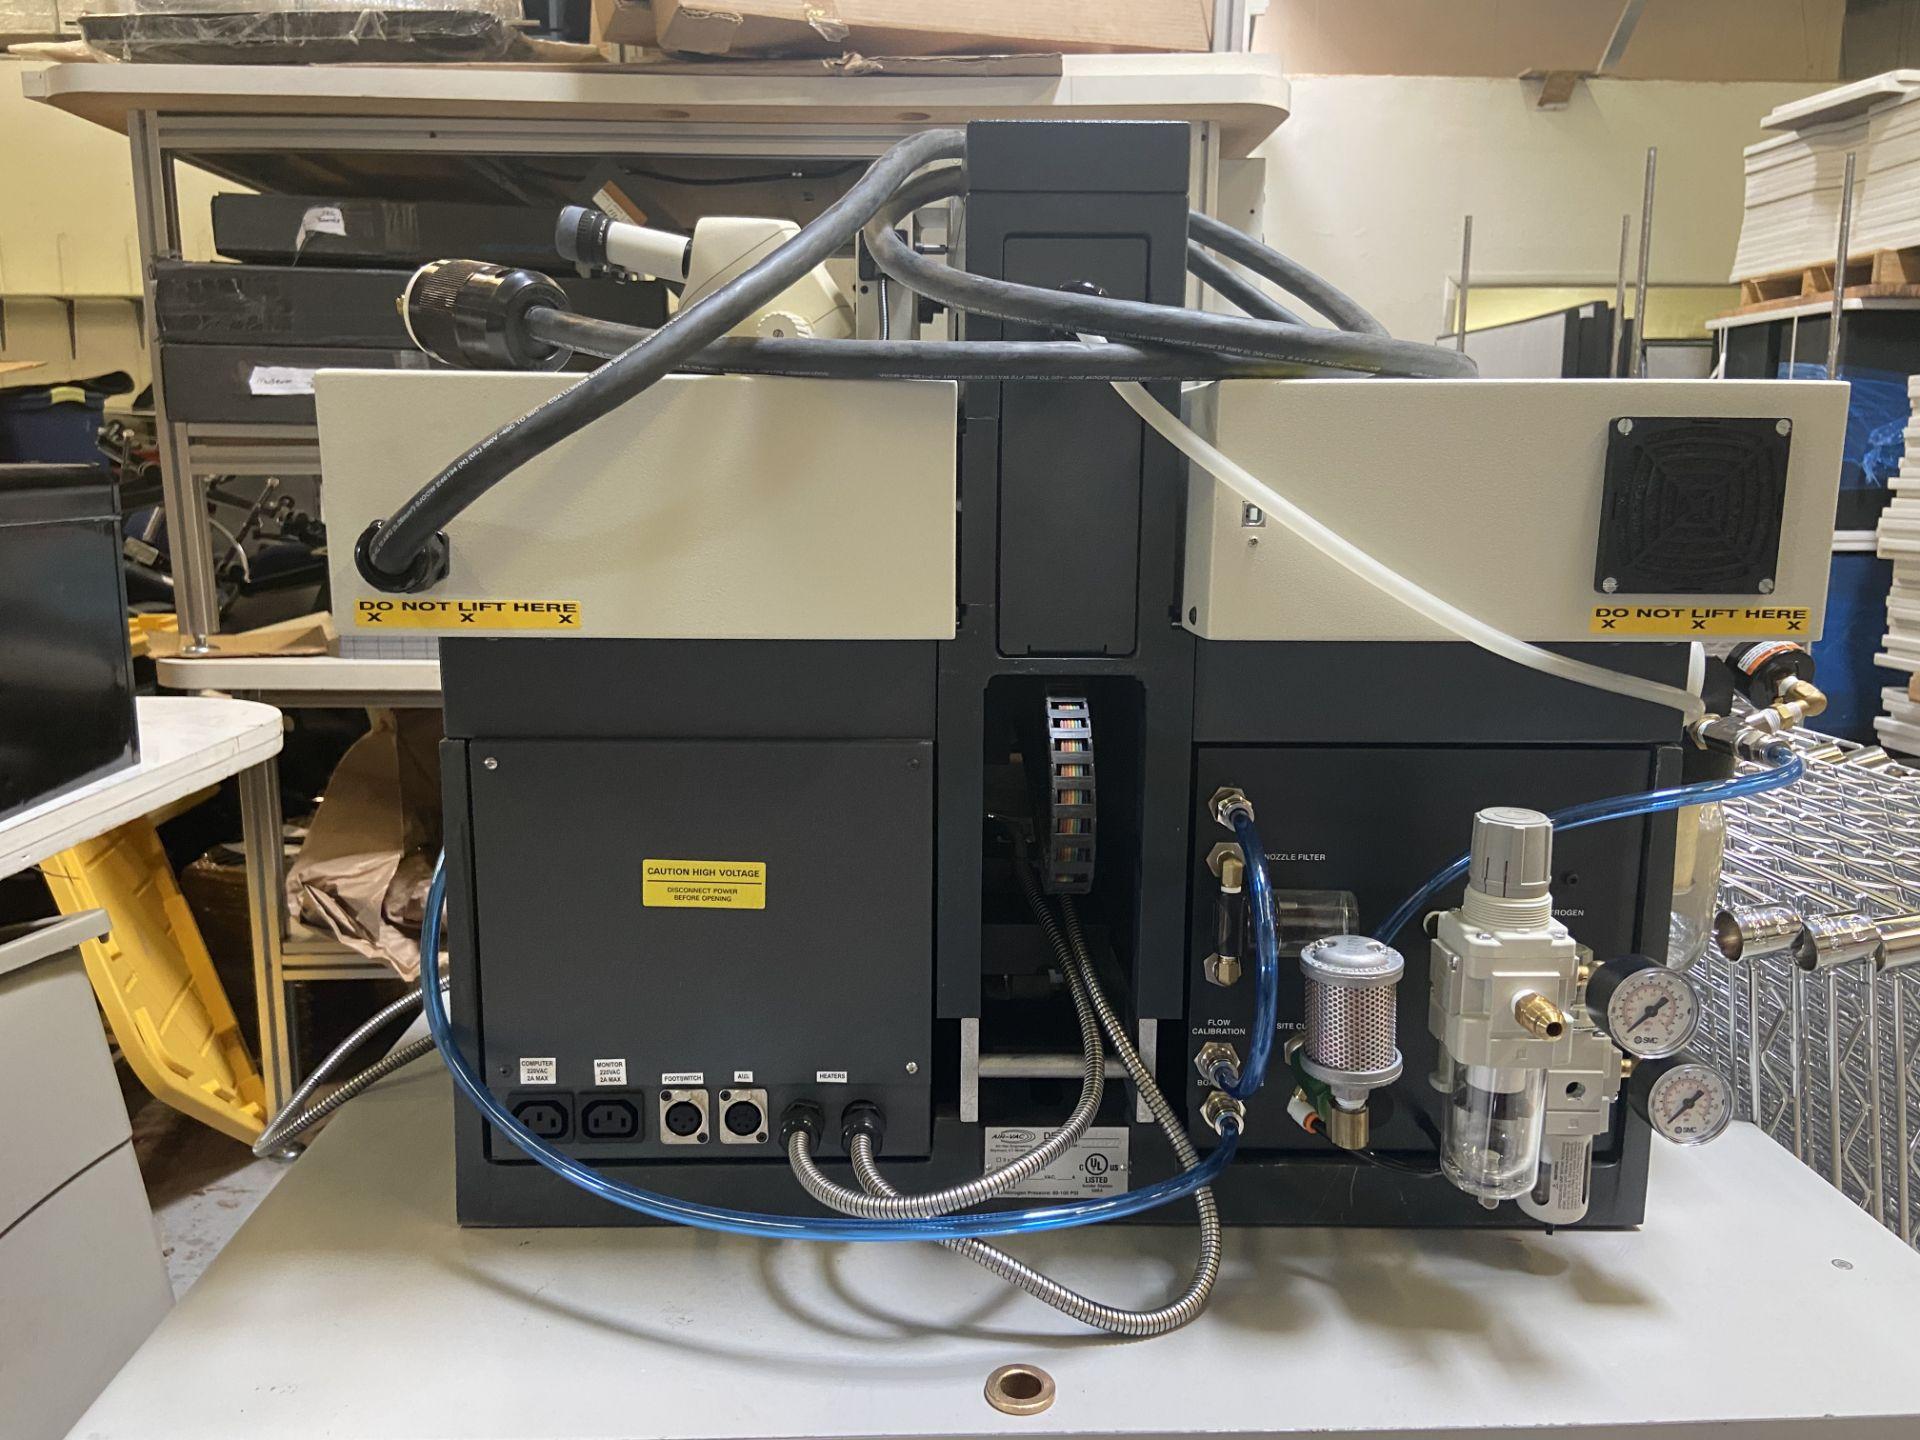 Air-Vac Rework Station, Model# DRS25, Serial# 0519-U6175, 208/240V, 3 Phase, 20 Amps, 50/60 Hz, - Image 4 of 14